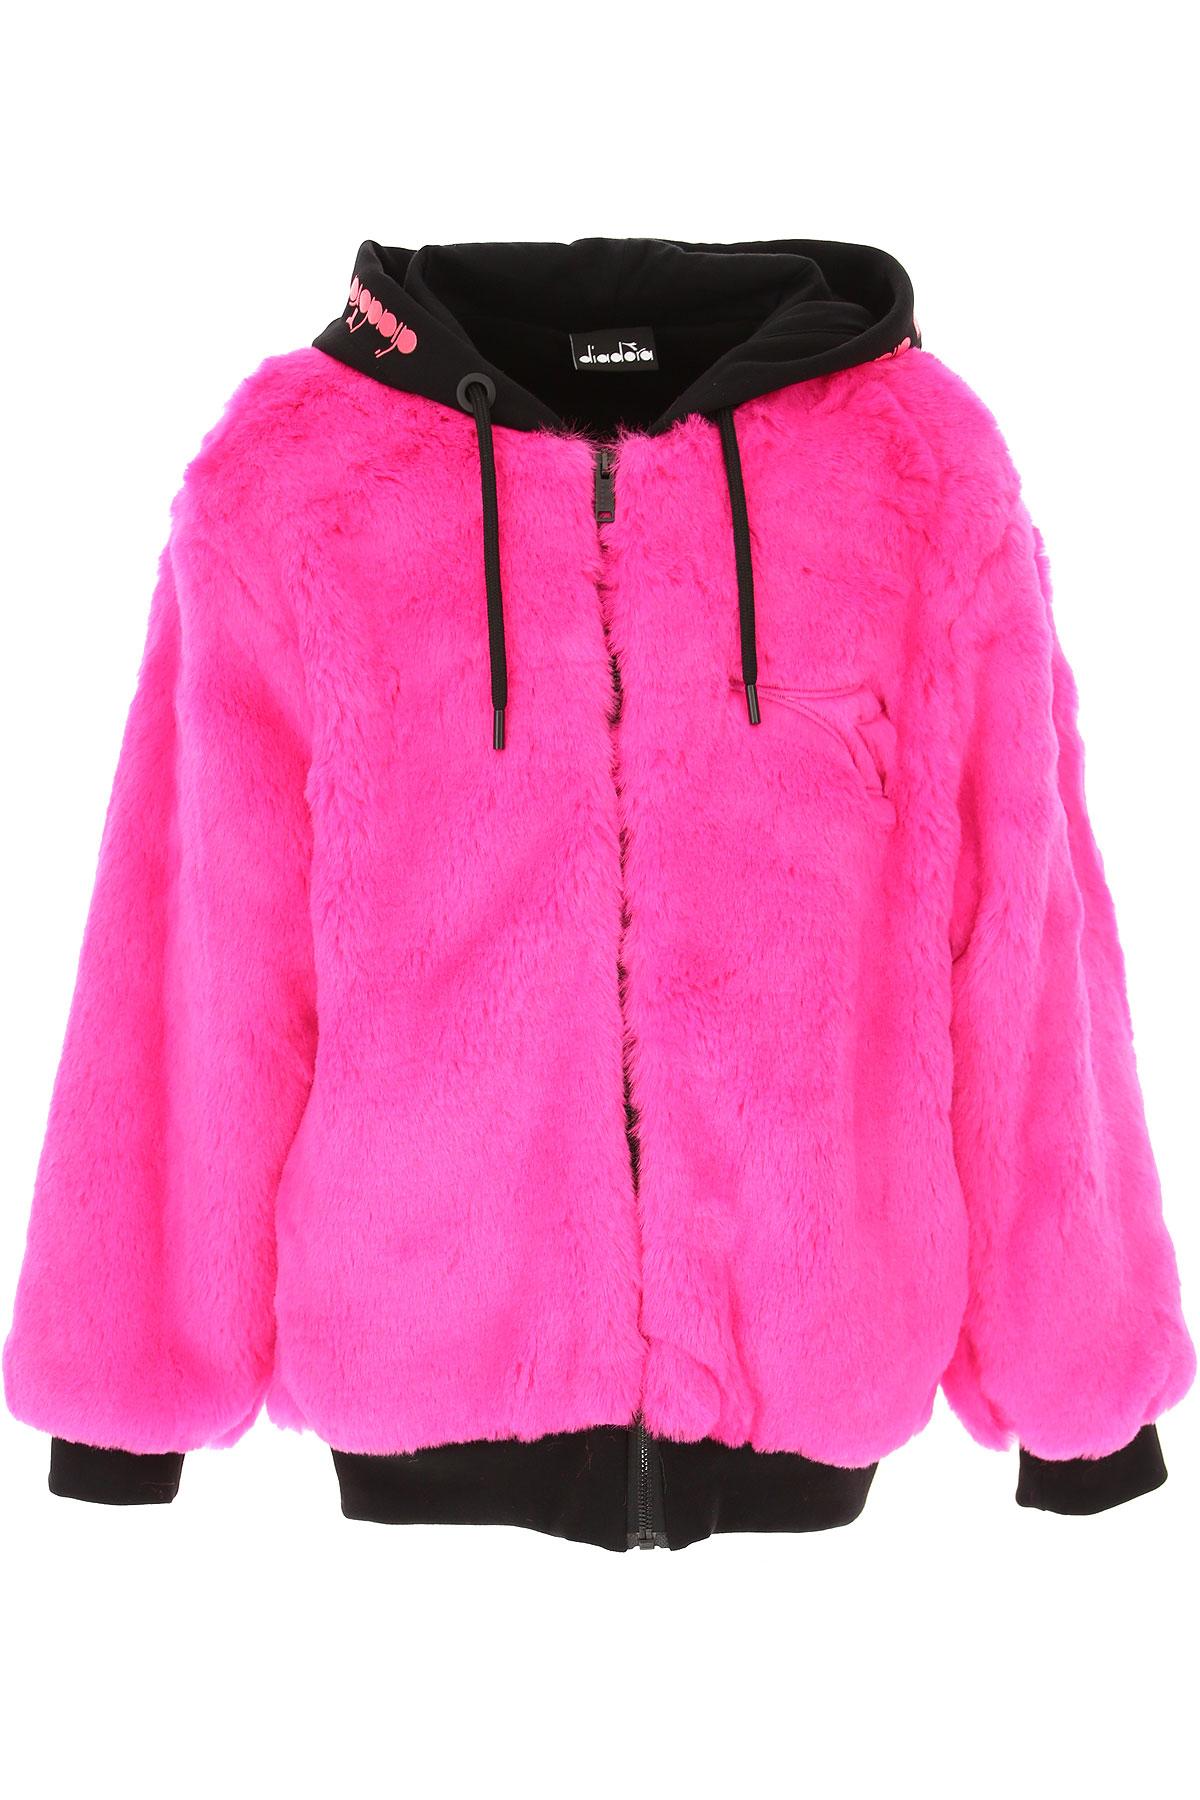 Diadora Kids Sweatshirts & Hoodies for Girls On Sale, fluo Fucsia, polyester, 2019, 10Y 12Y 14Y